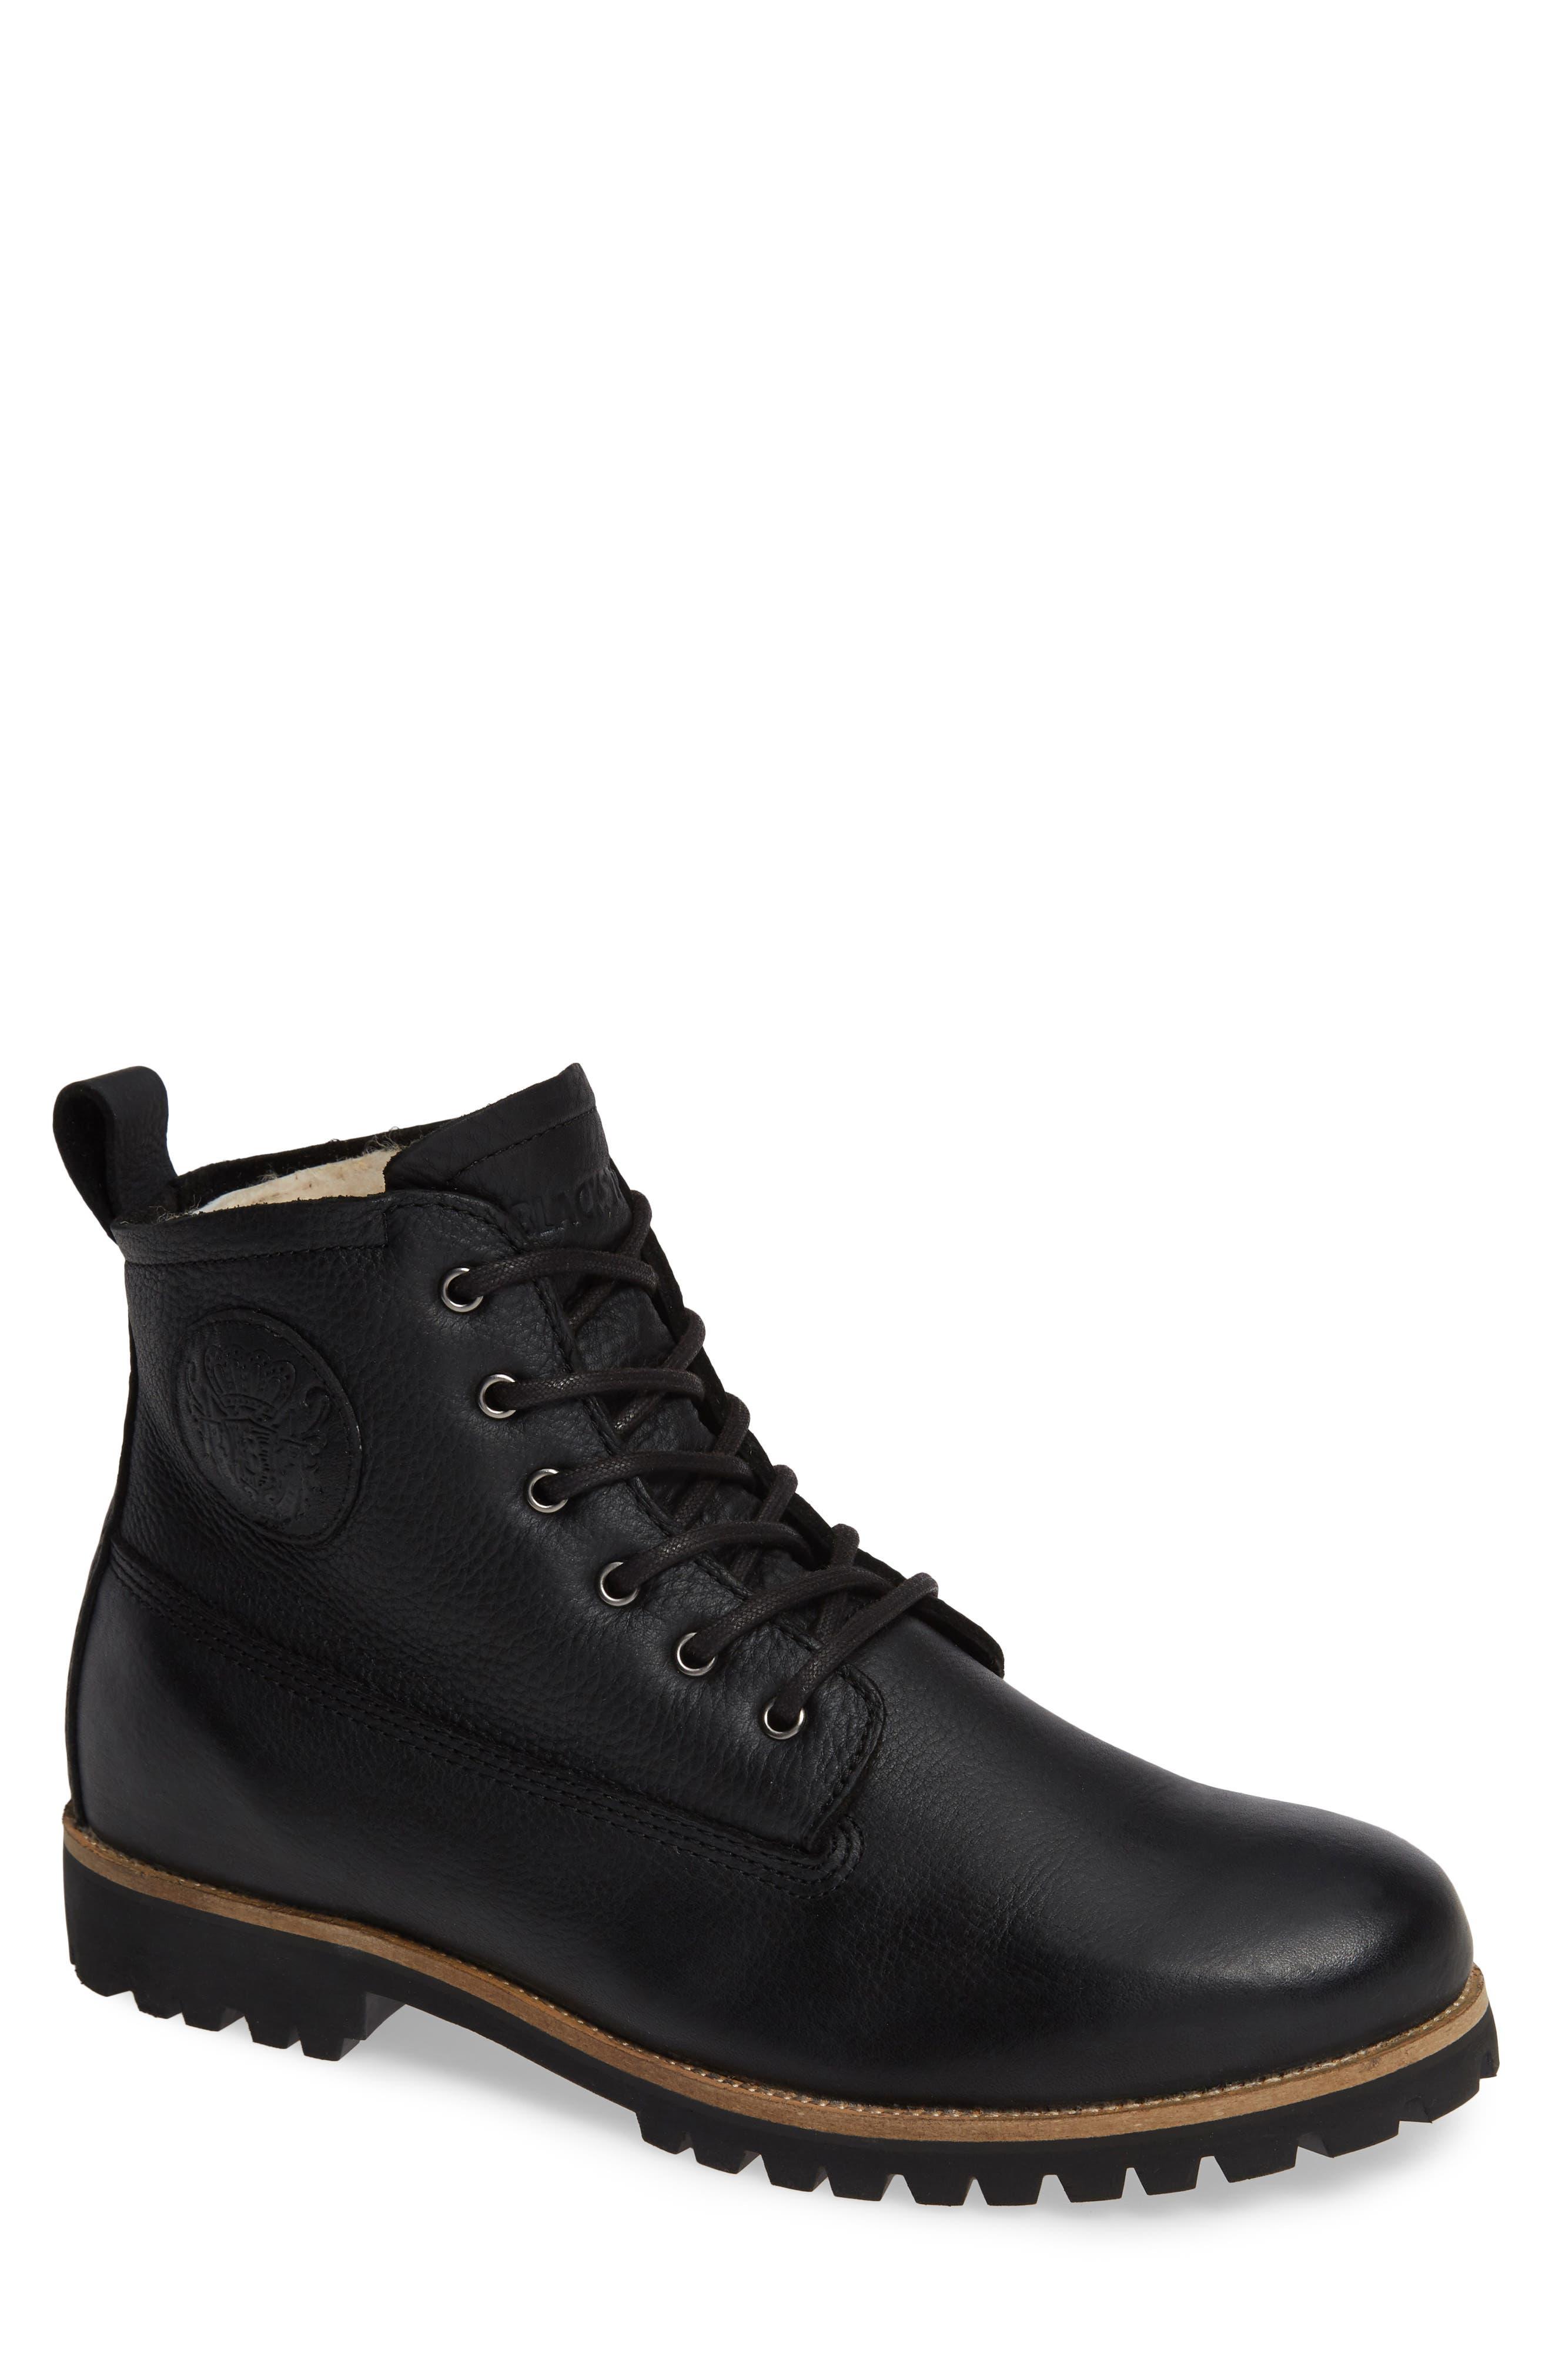 Blackstone Blackstone Nordstrom Shoes Shoes Men's Men's qX5n5t